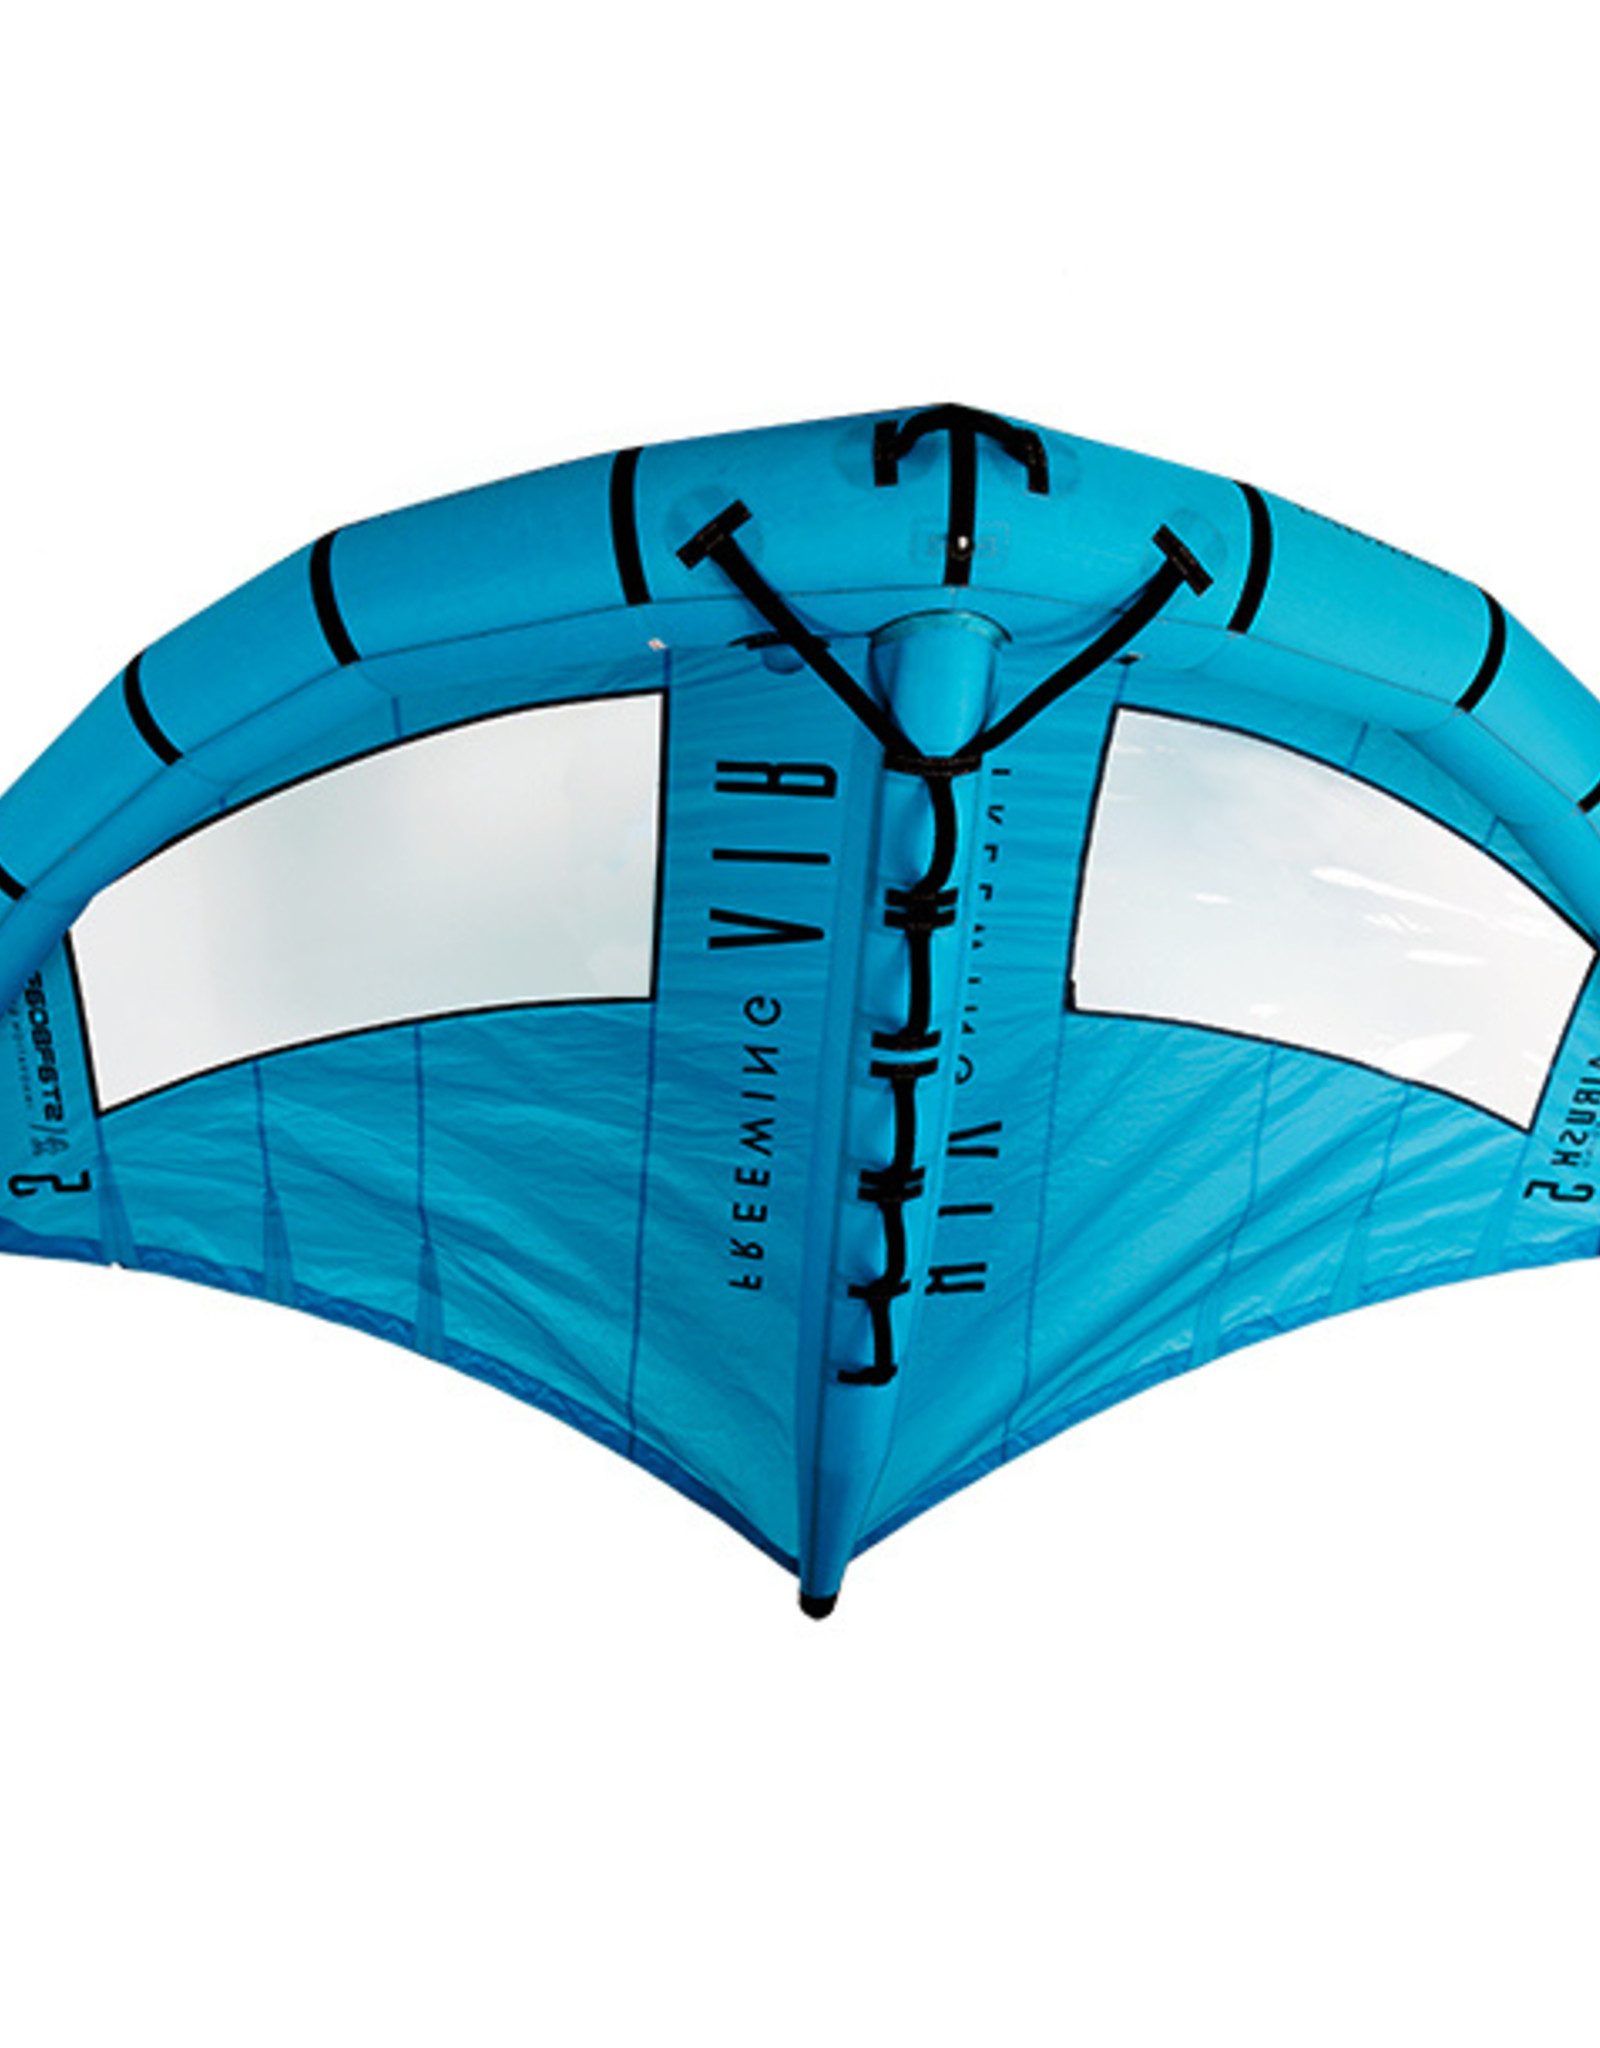 Airush Starboard Airush Freewing AIR 5m teal